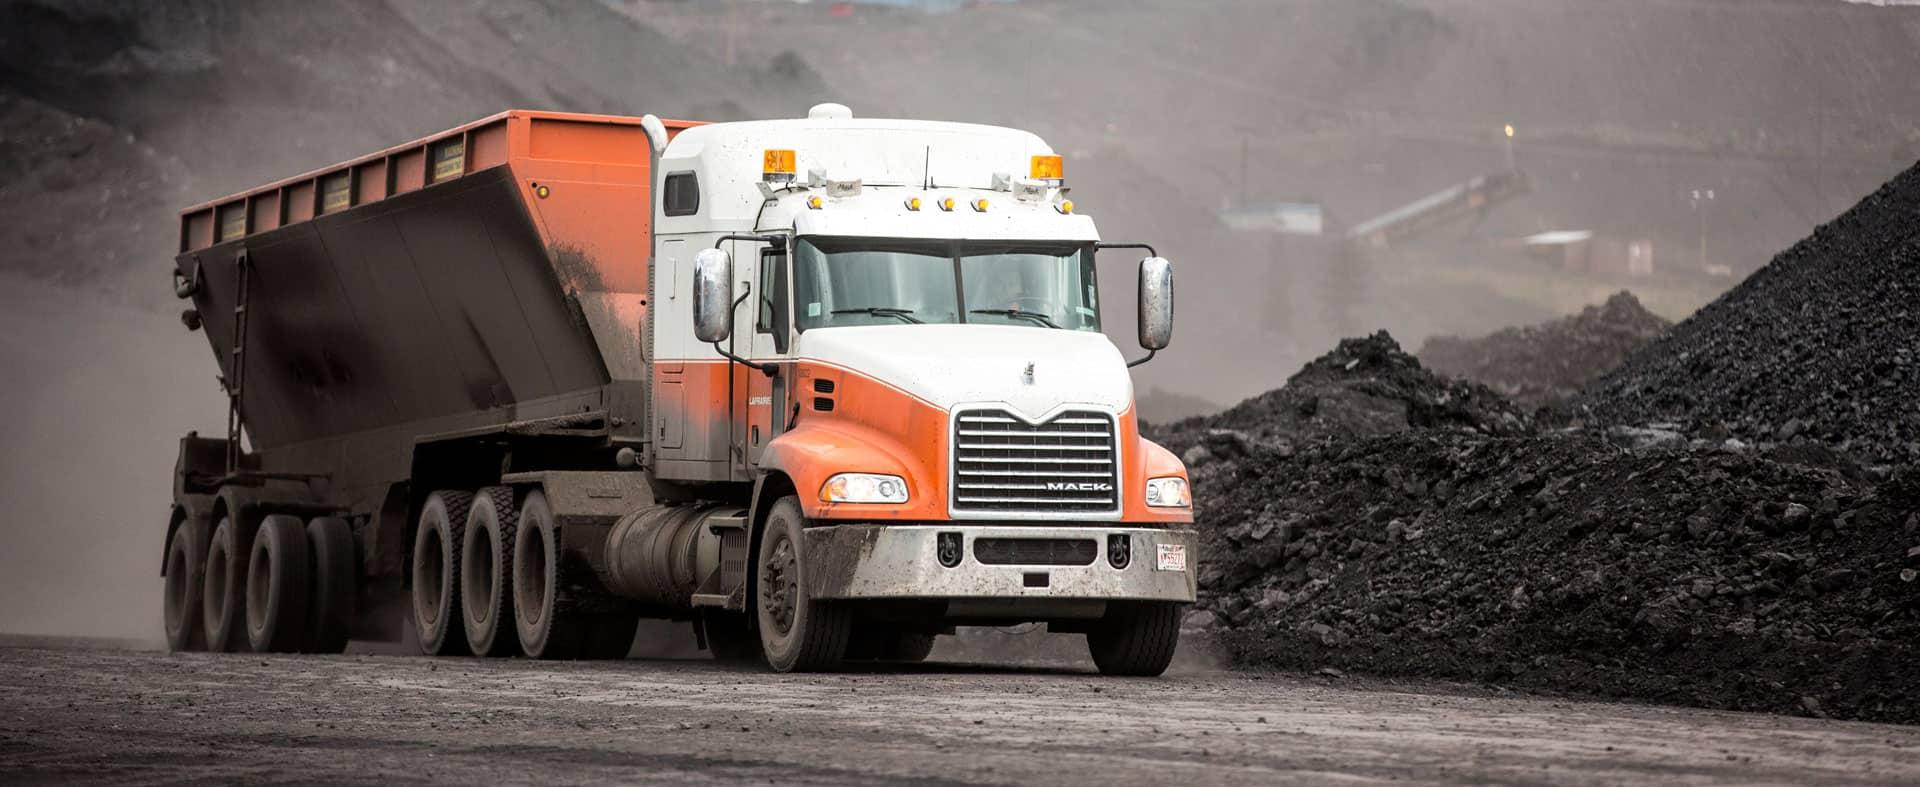 Oilfield Coal Haul 5